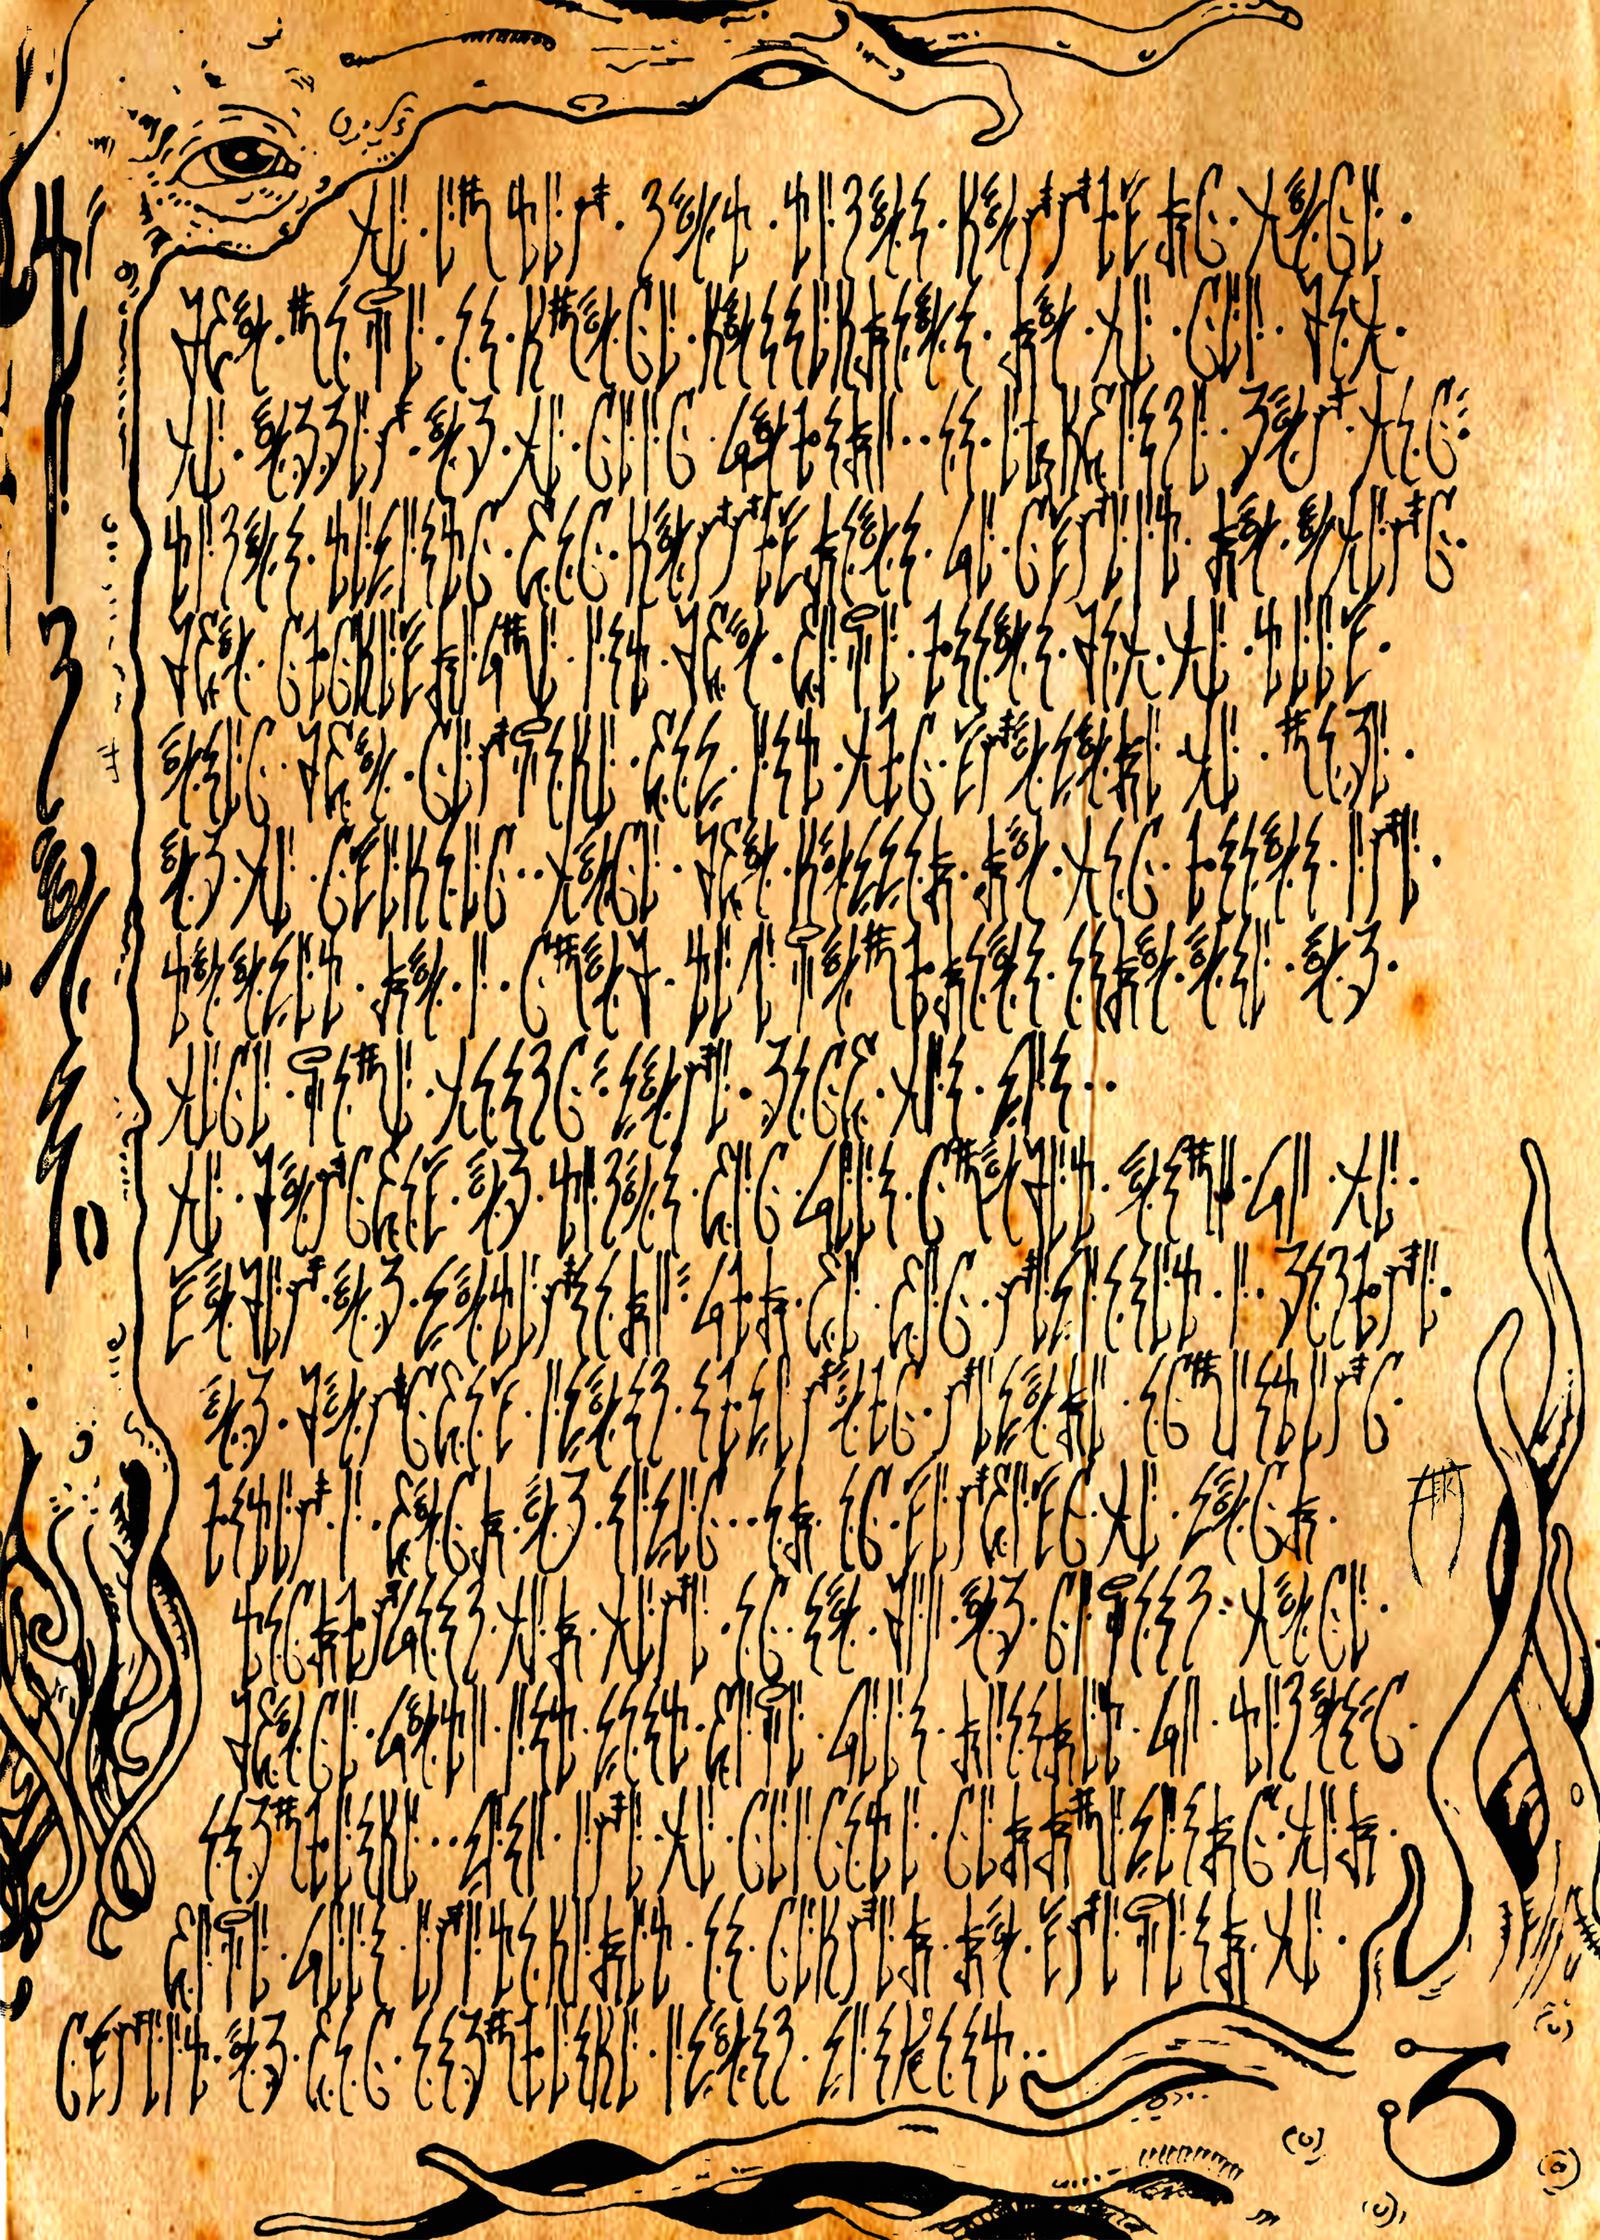 Lovecraft Grimoire Page (Text) by AzrielMordecai